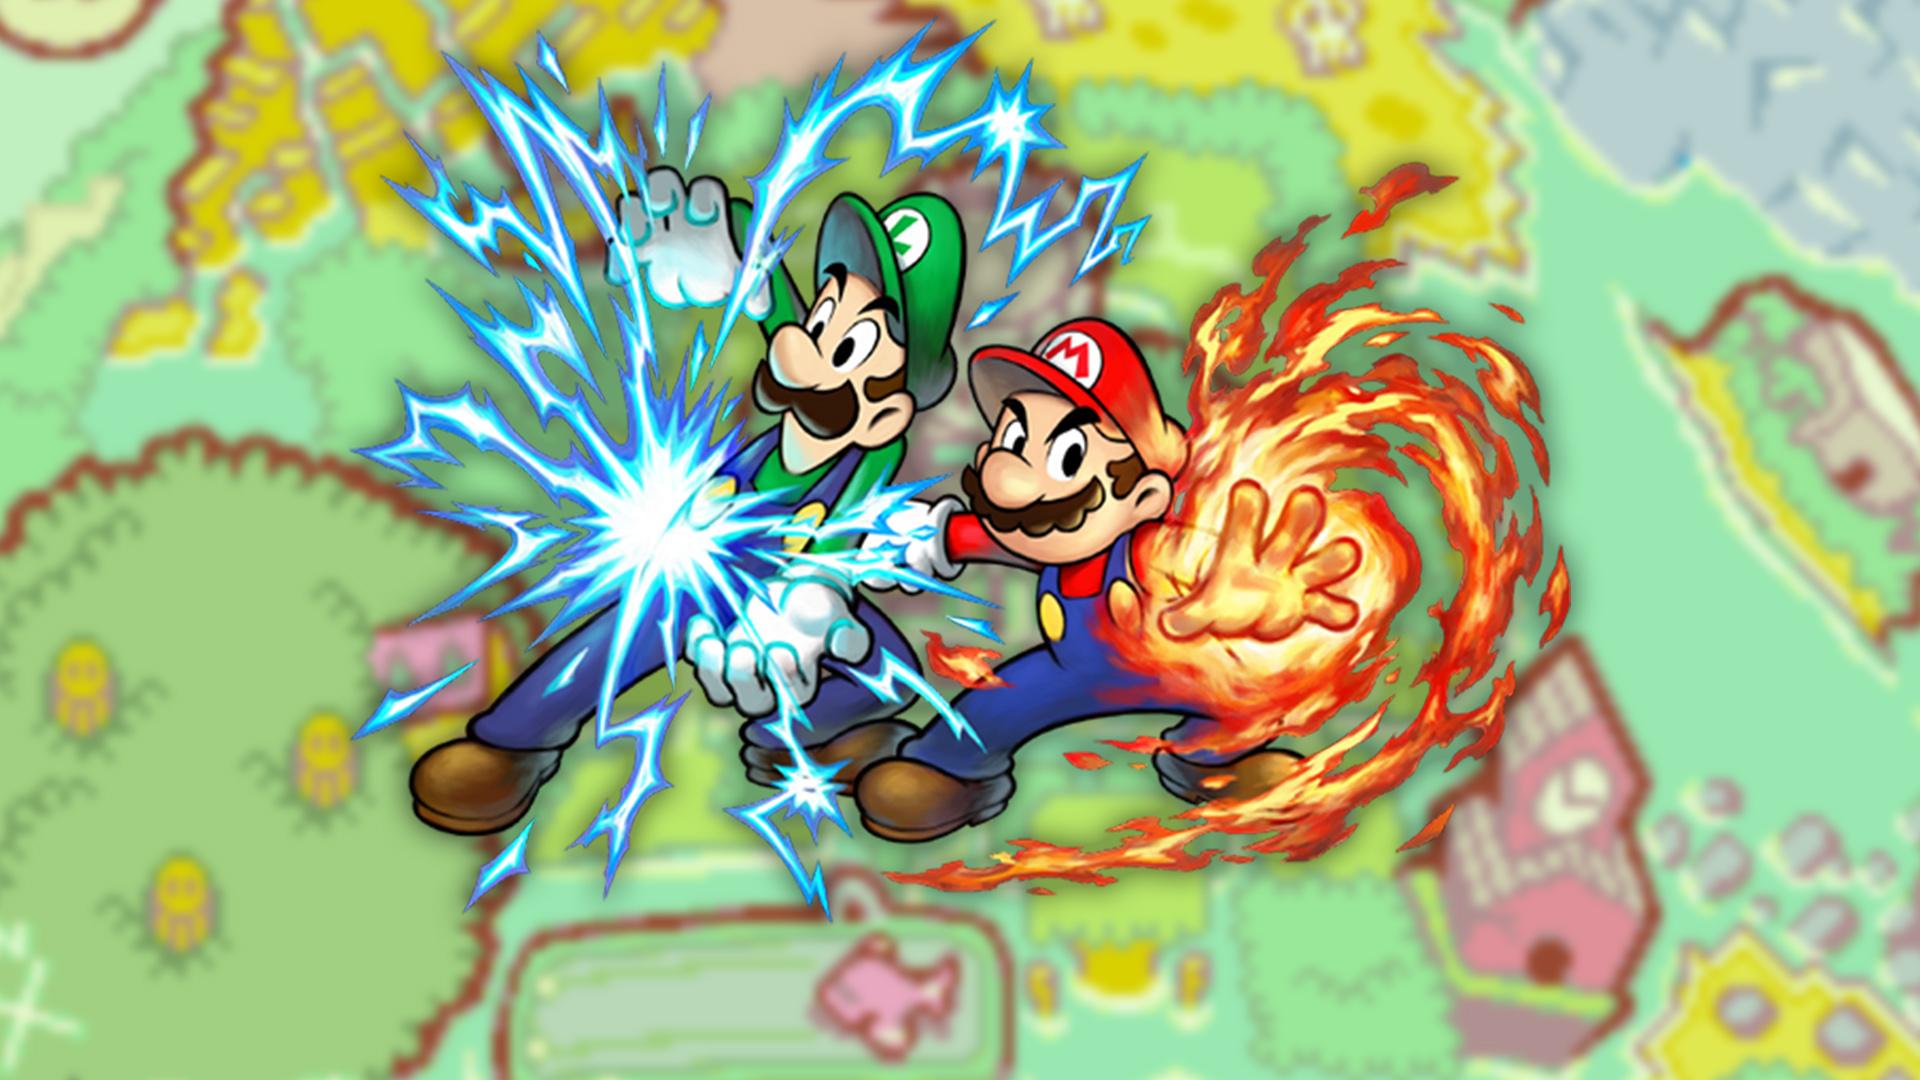 Mario U0026 Luigi Superstar Saga + Bowsers Minions Launch Trailer